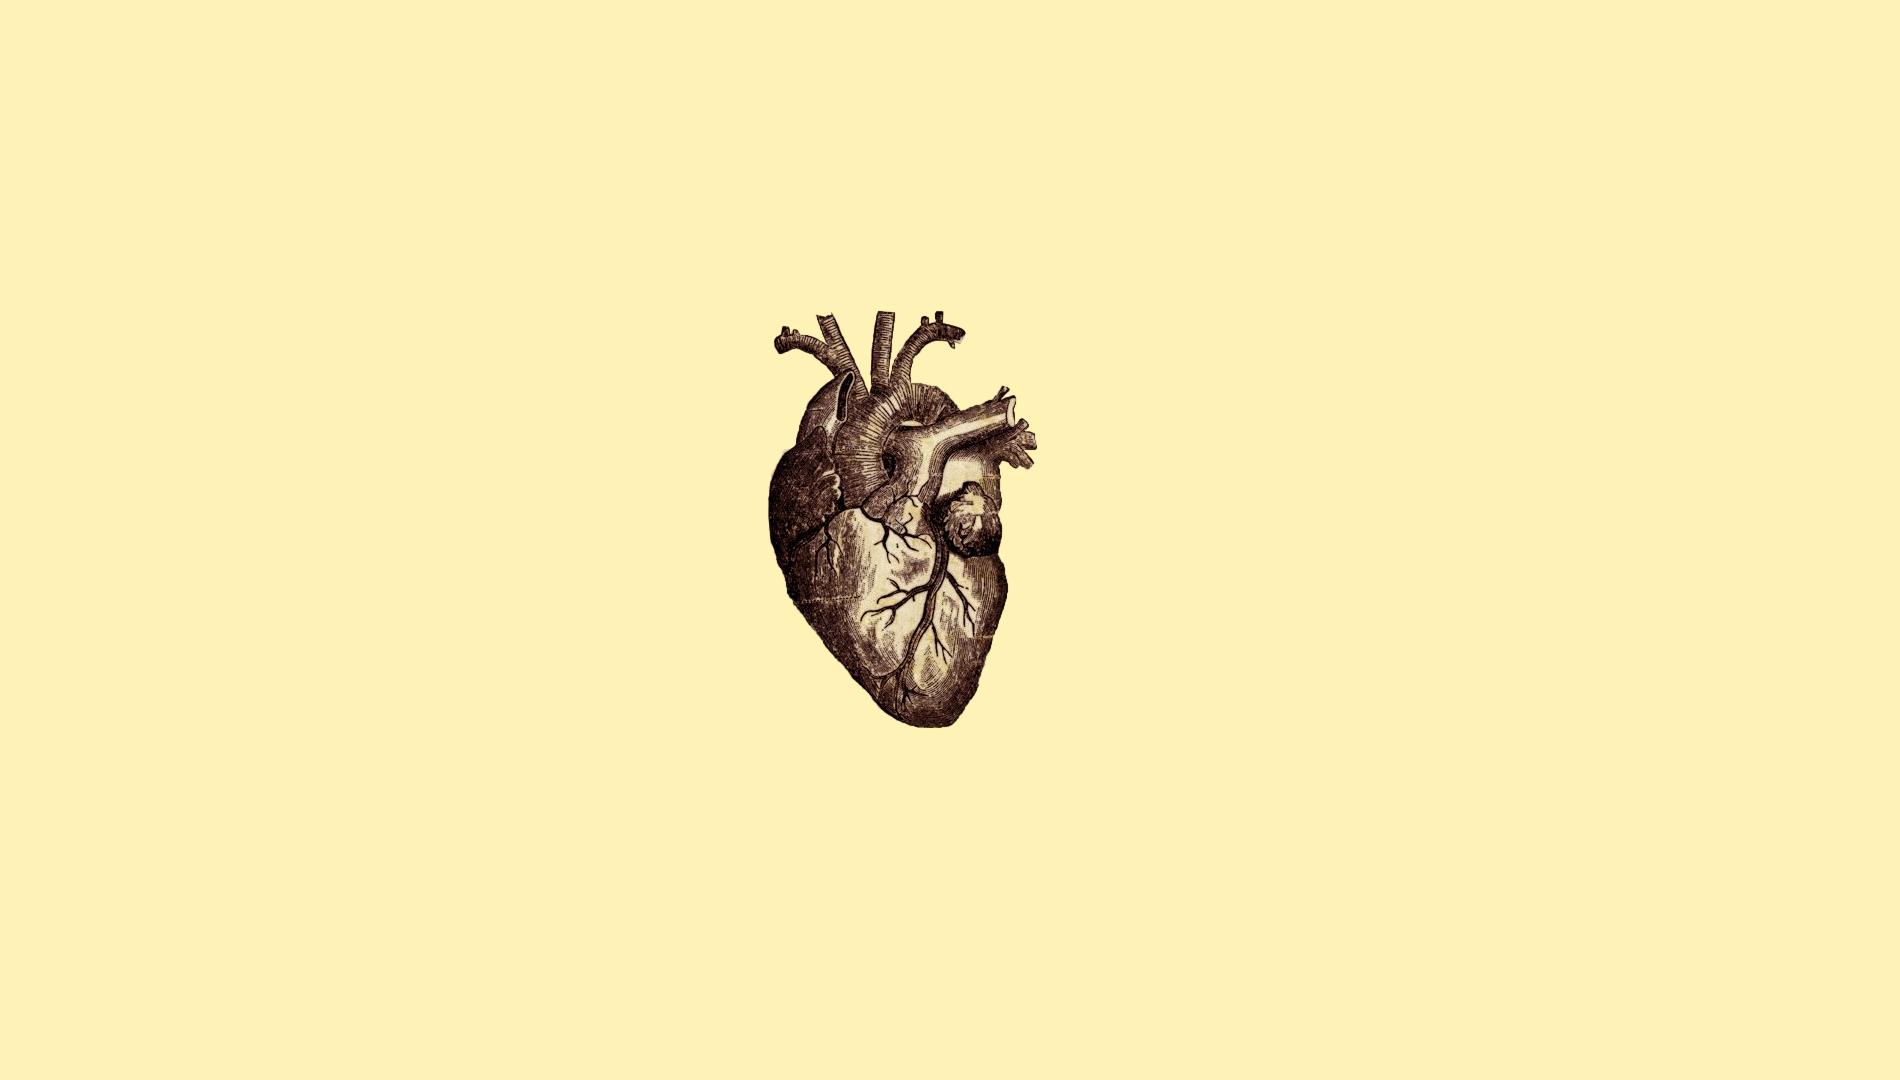 Wallpaper Drawing Illustration Digital Art Simple